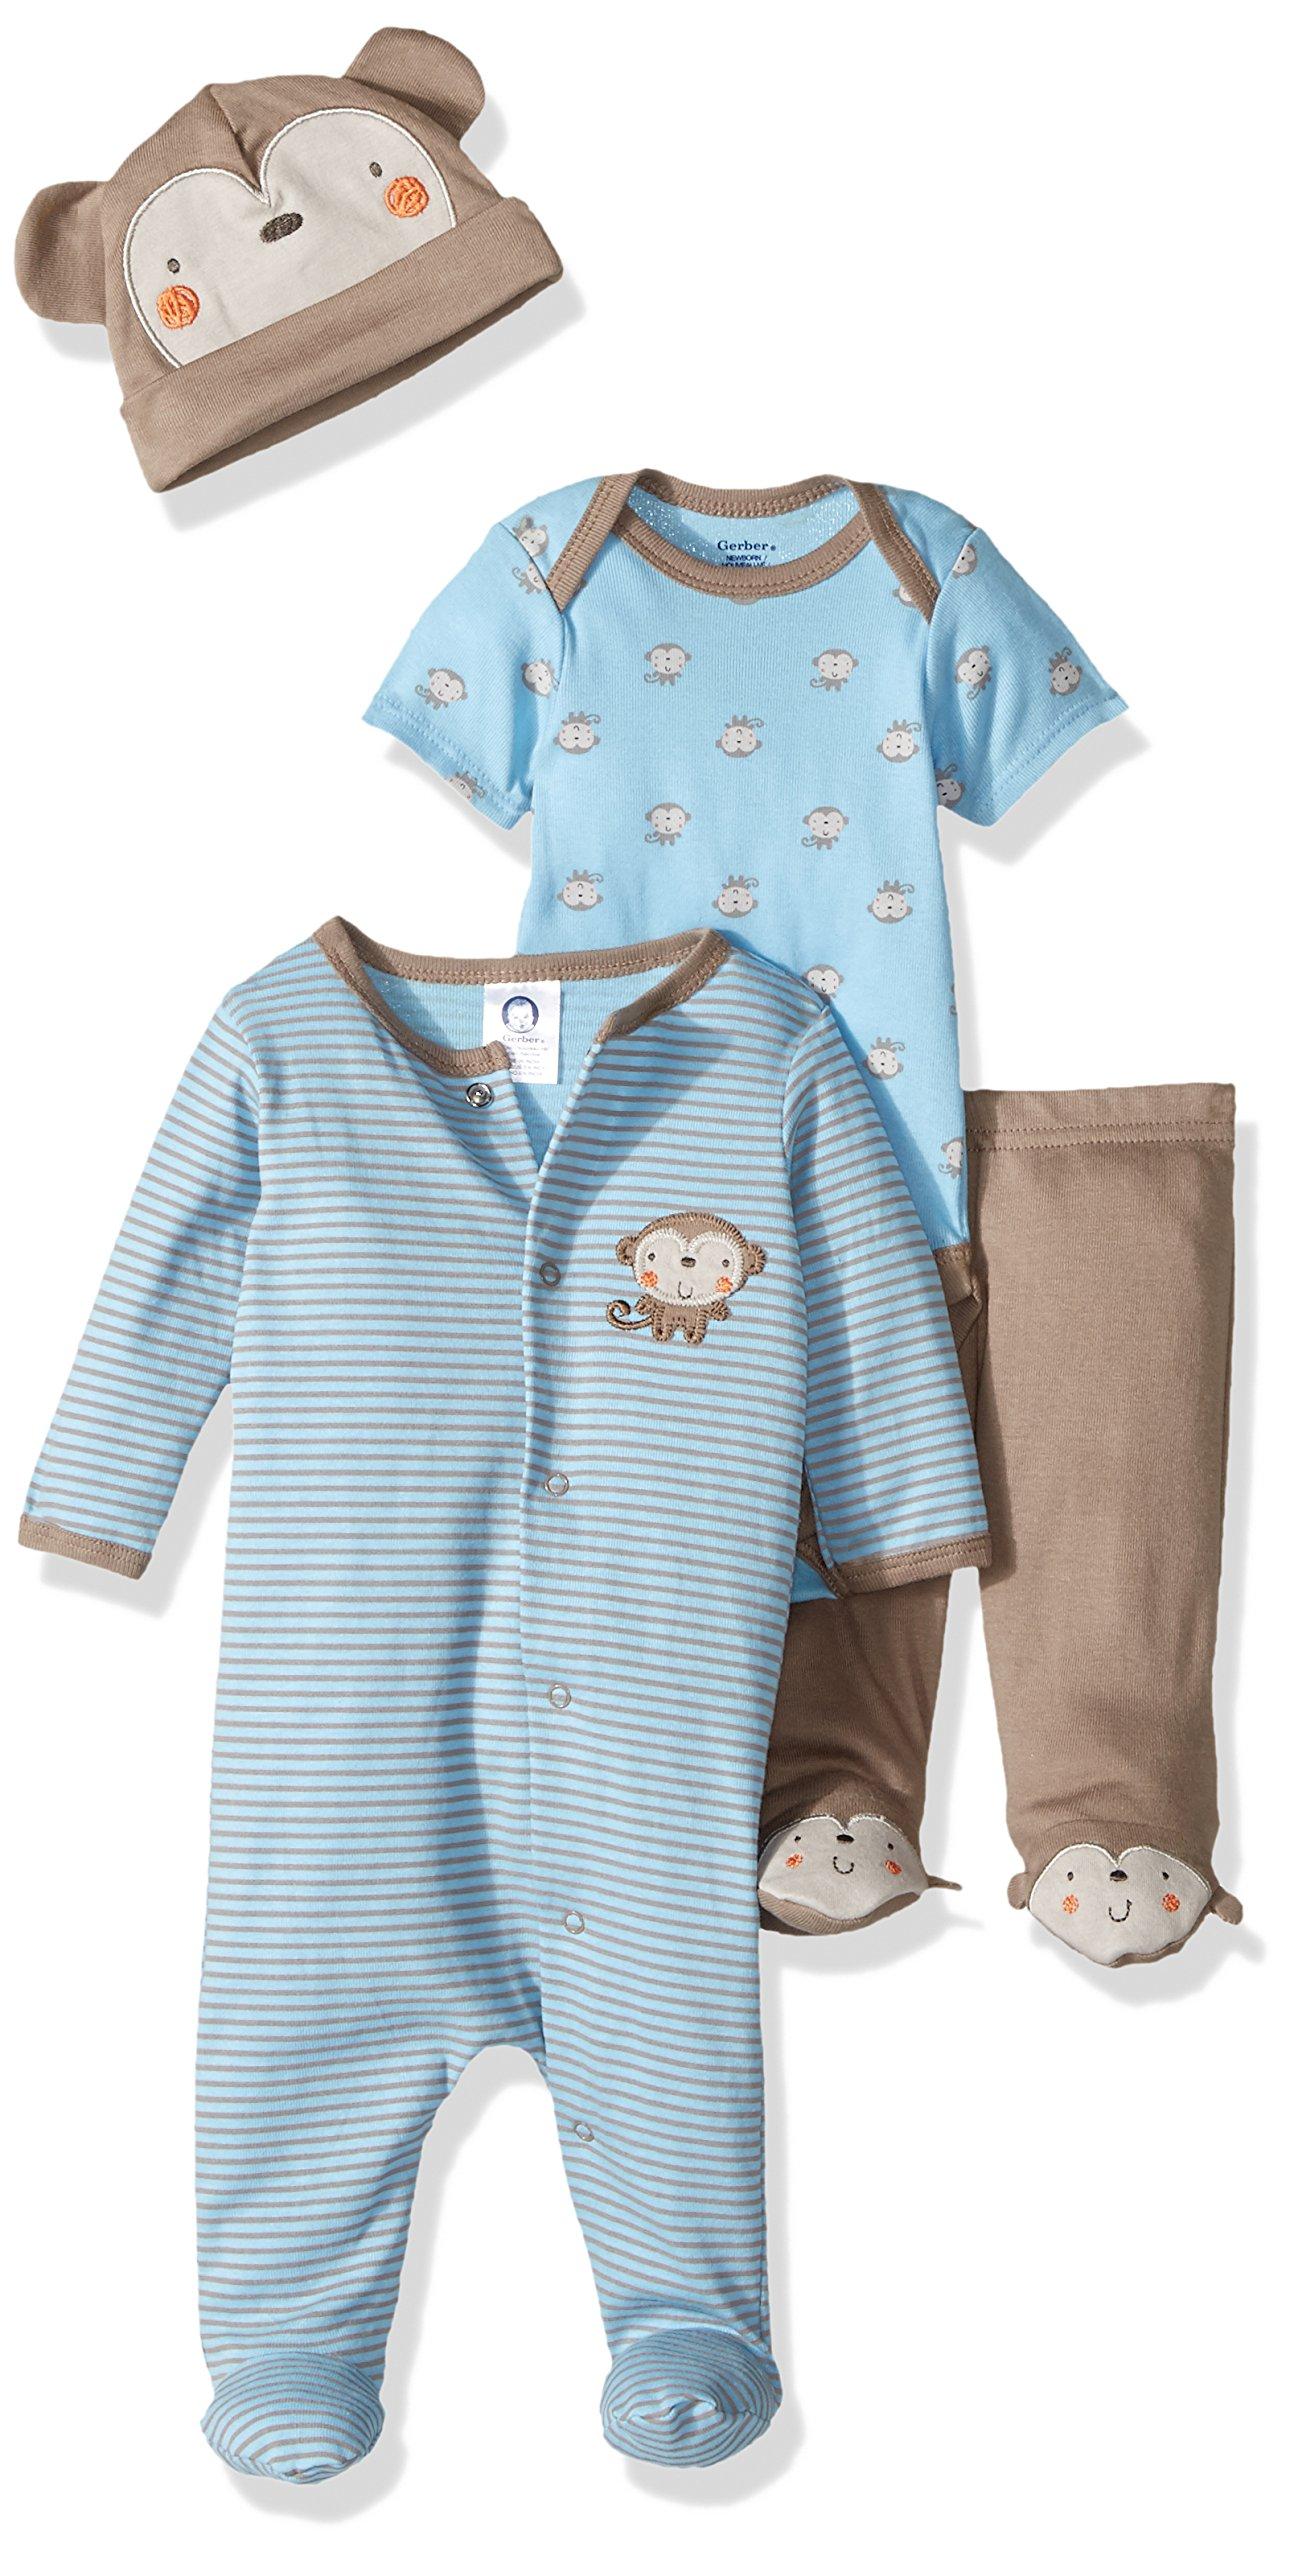 Gerber Baby Boy 4 Piece Sleep 'n Play, Onesies, Footed Pant and Cap Set, Monkey, 6-9 Months